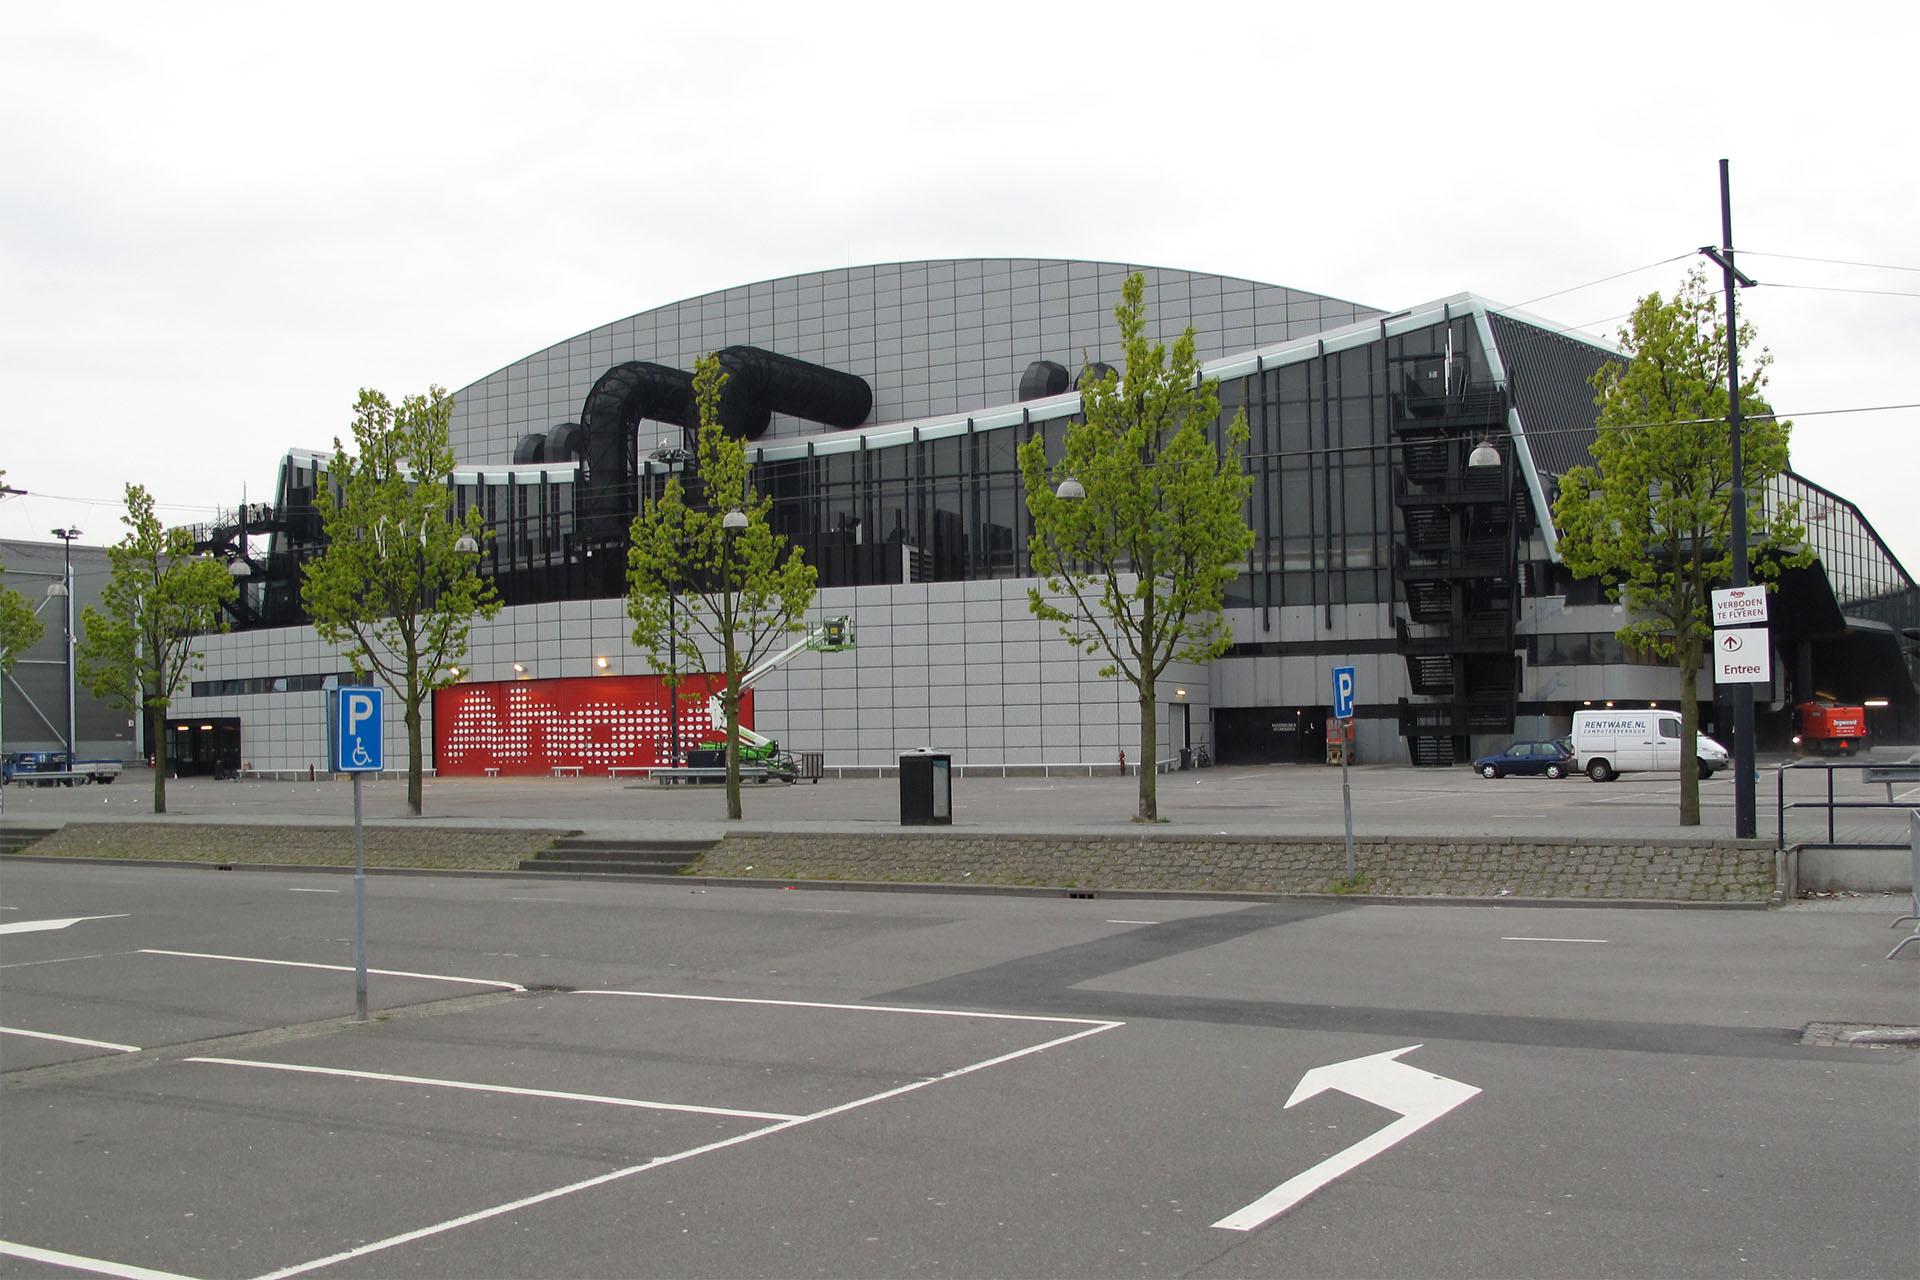 nl_rotterdam_ahoy_arena_11_web